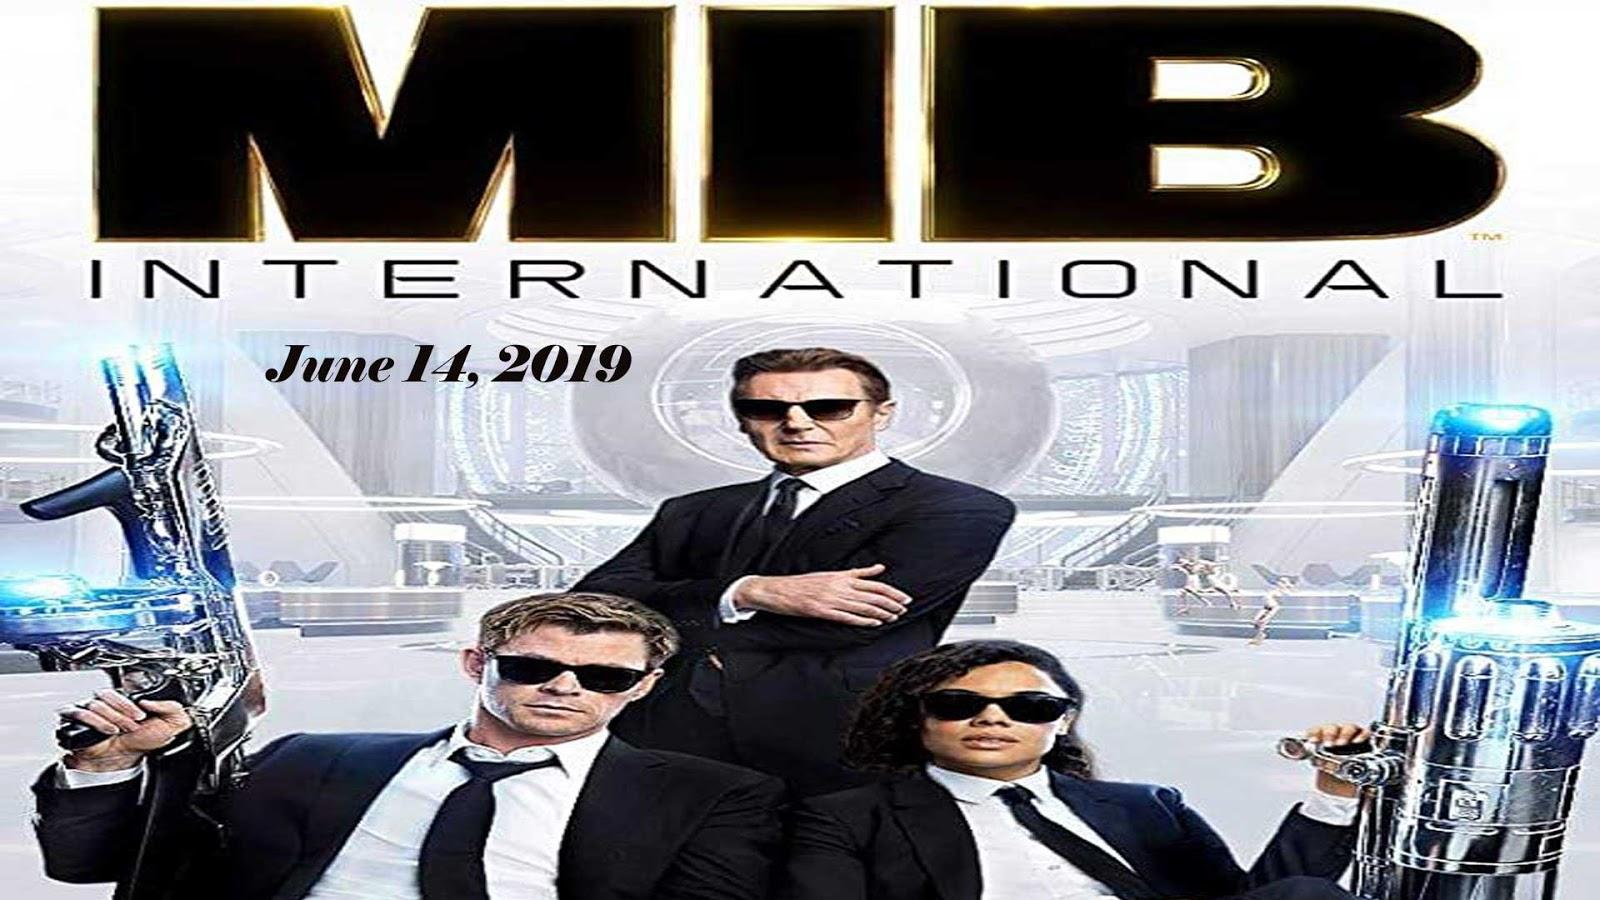 Movie Poster 2019: International (2019) (In Hindi